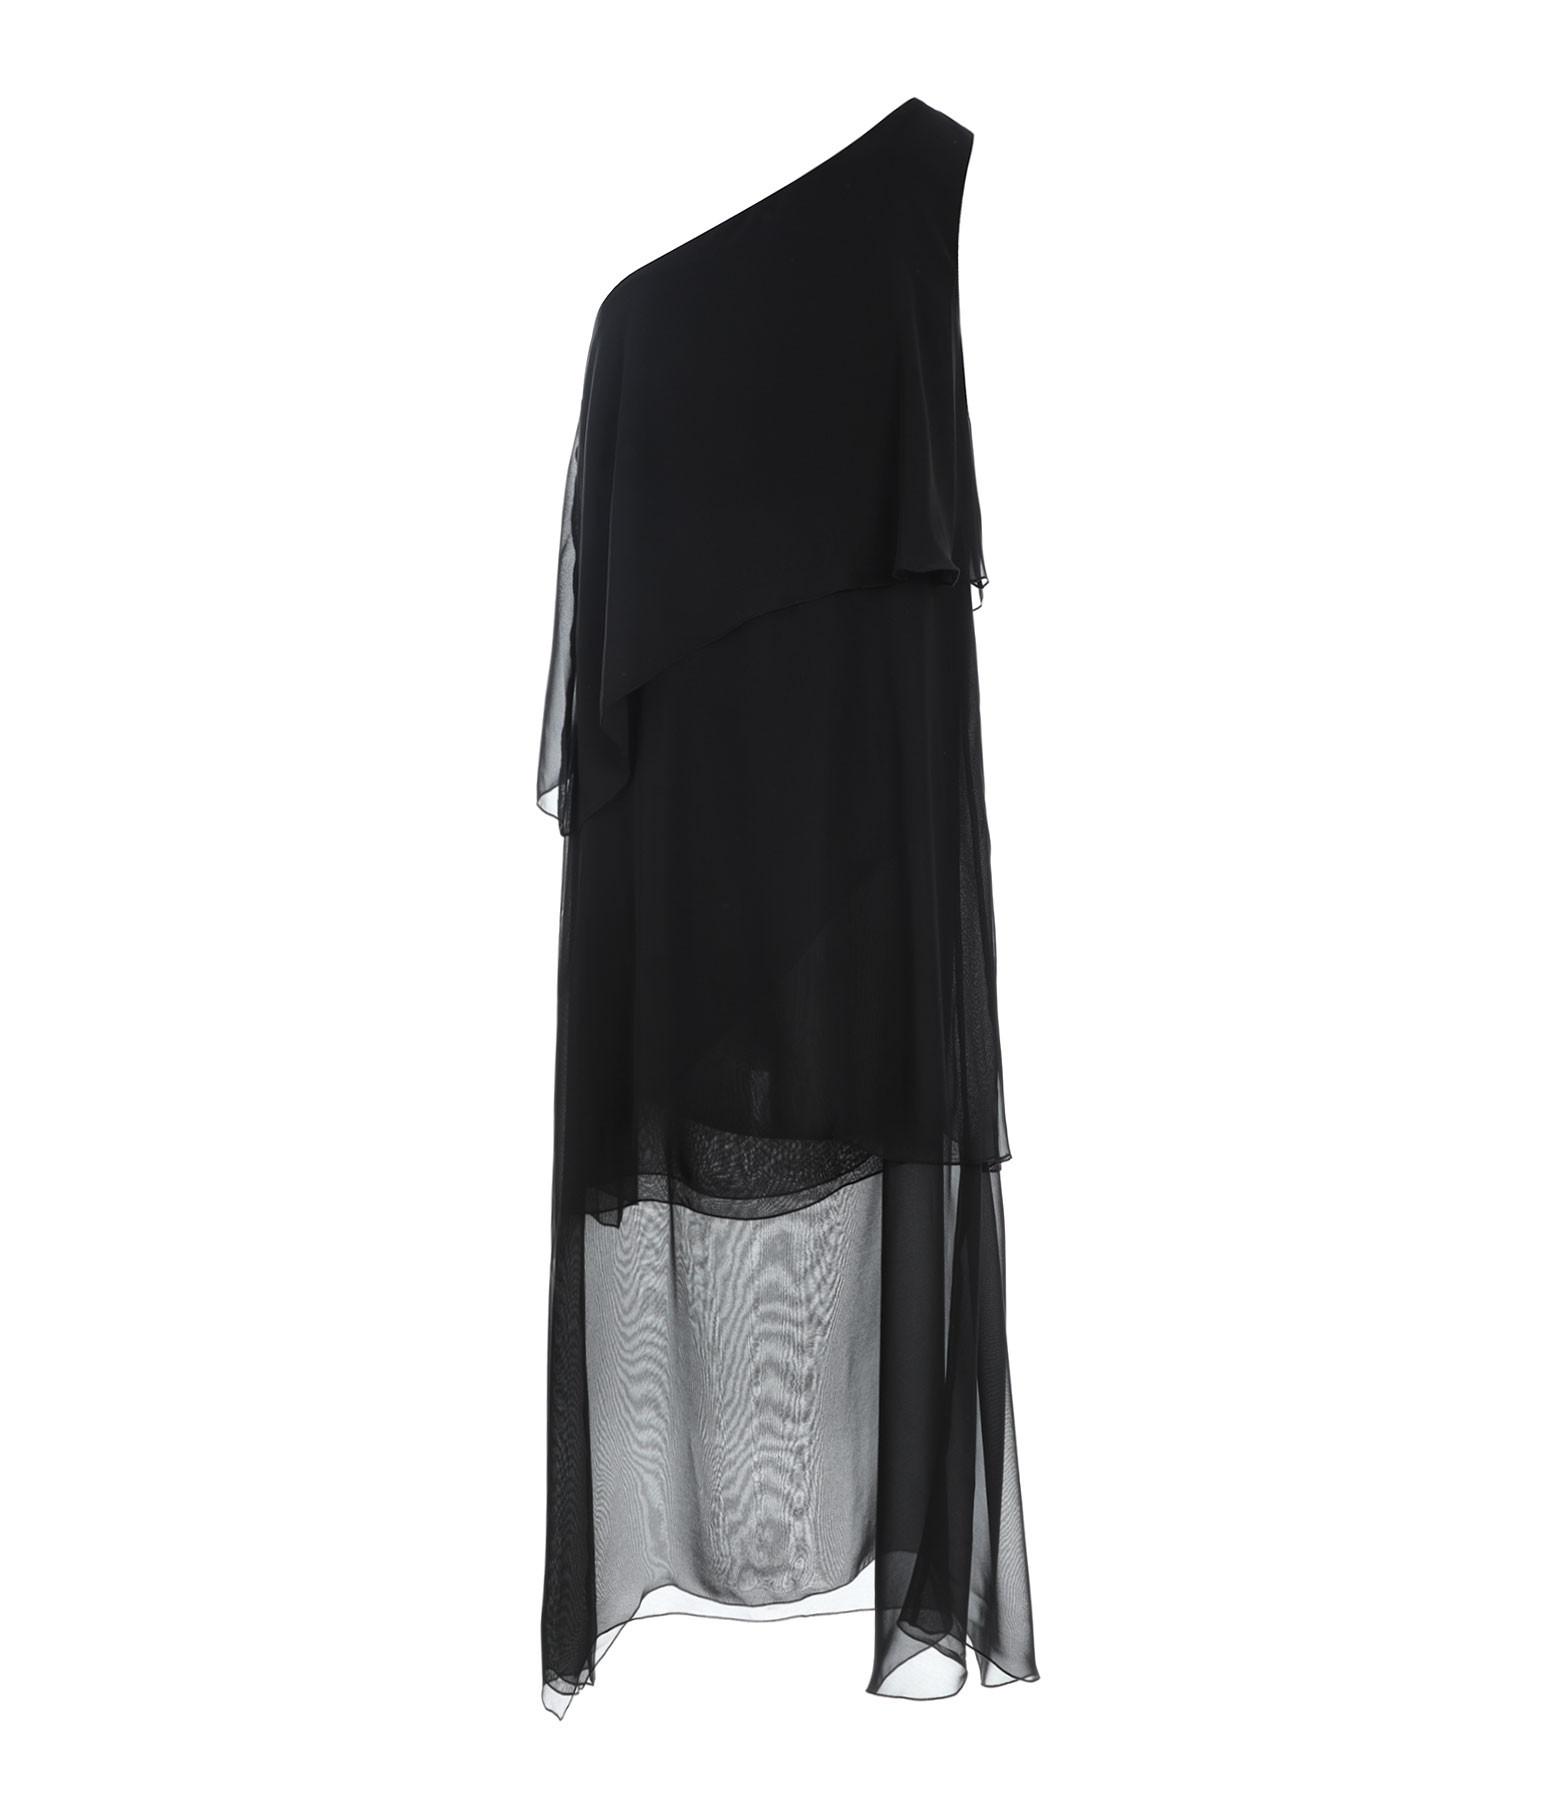 JEANNE VOULAND - Robe Fettya One Shoulder Volants Noir